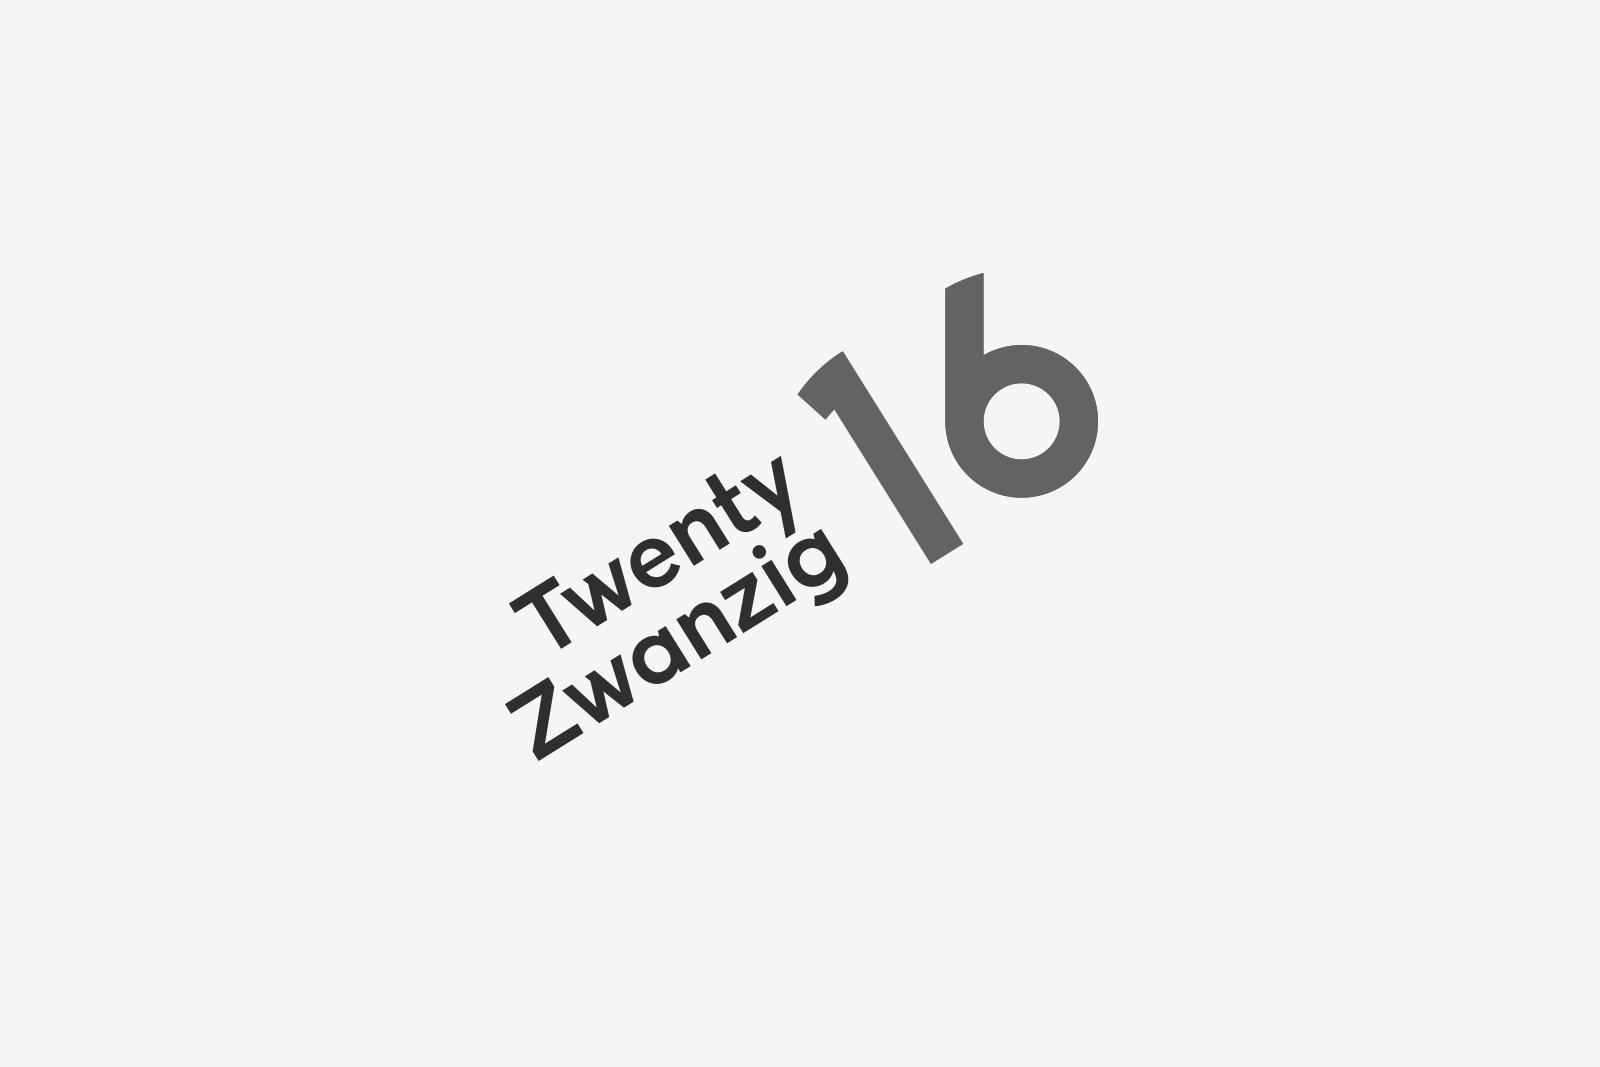 Logo Twenty 16 Bw